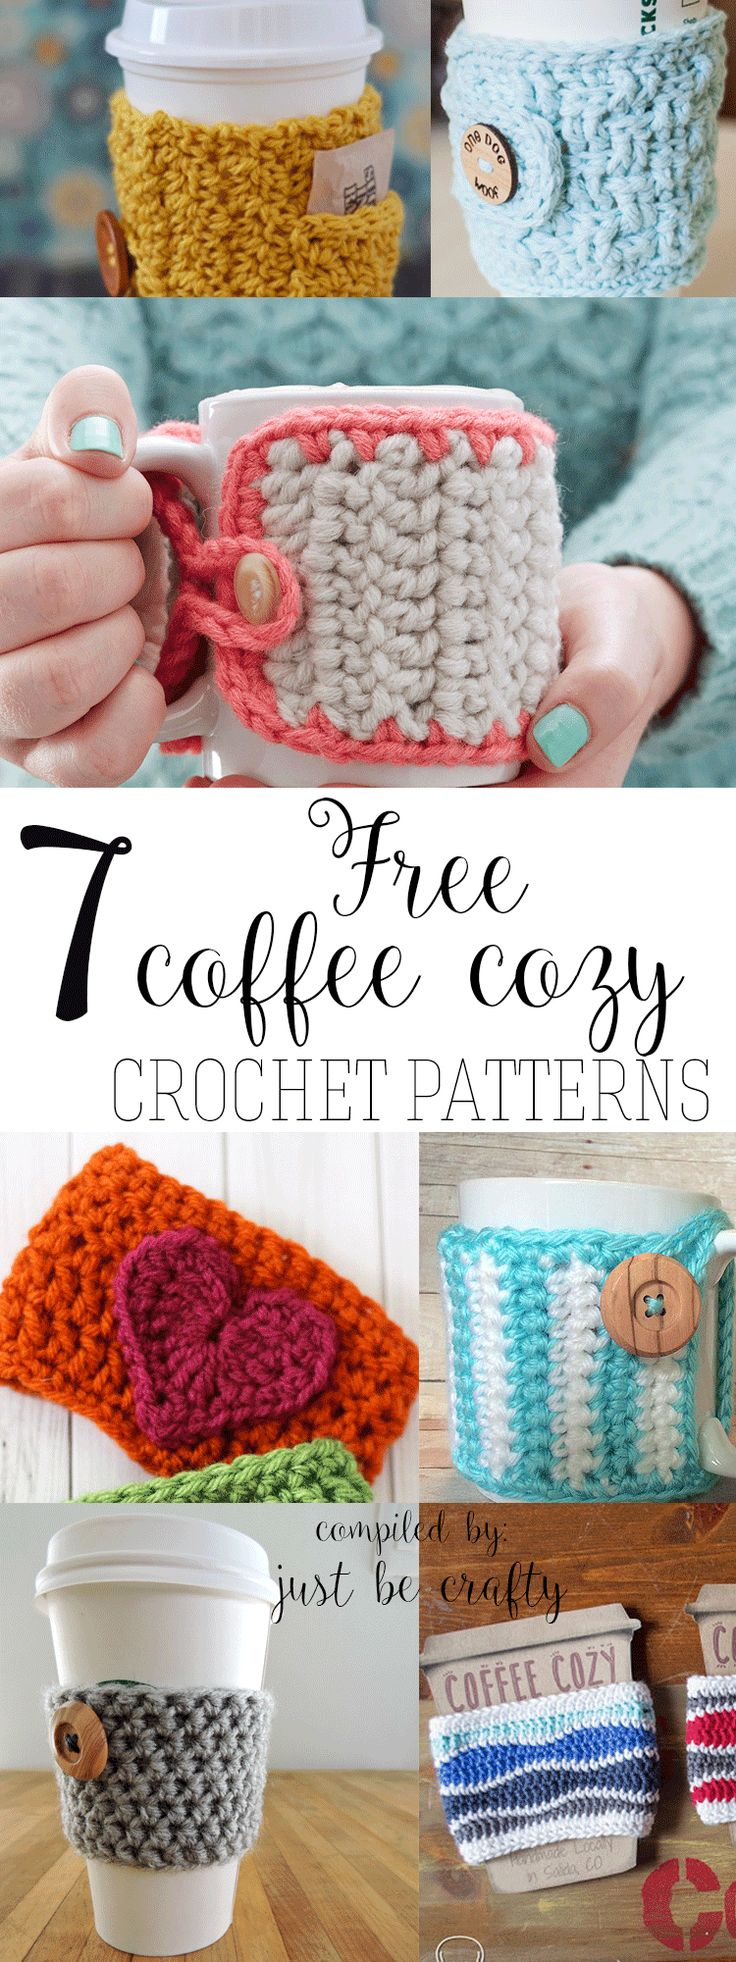 Free Crochet Coffee Cozy Patterns